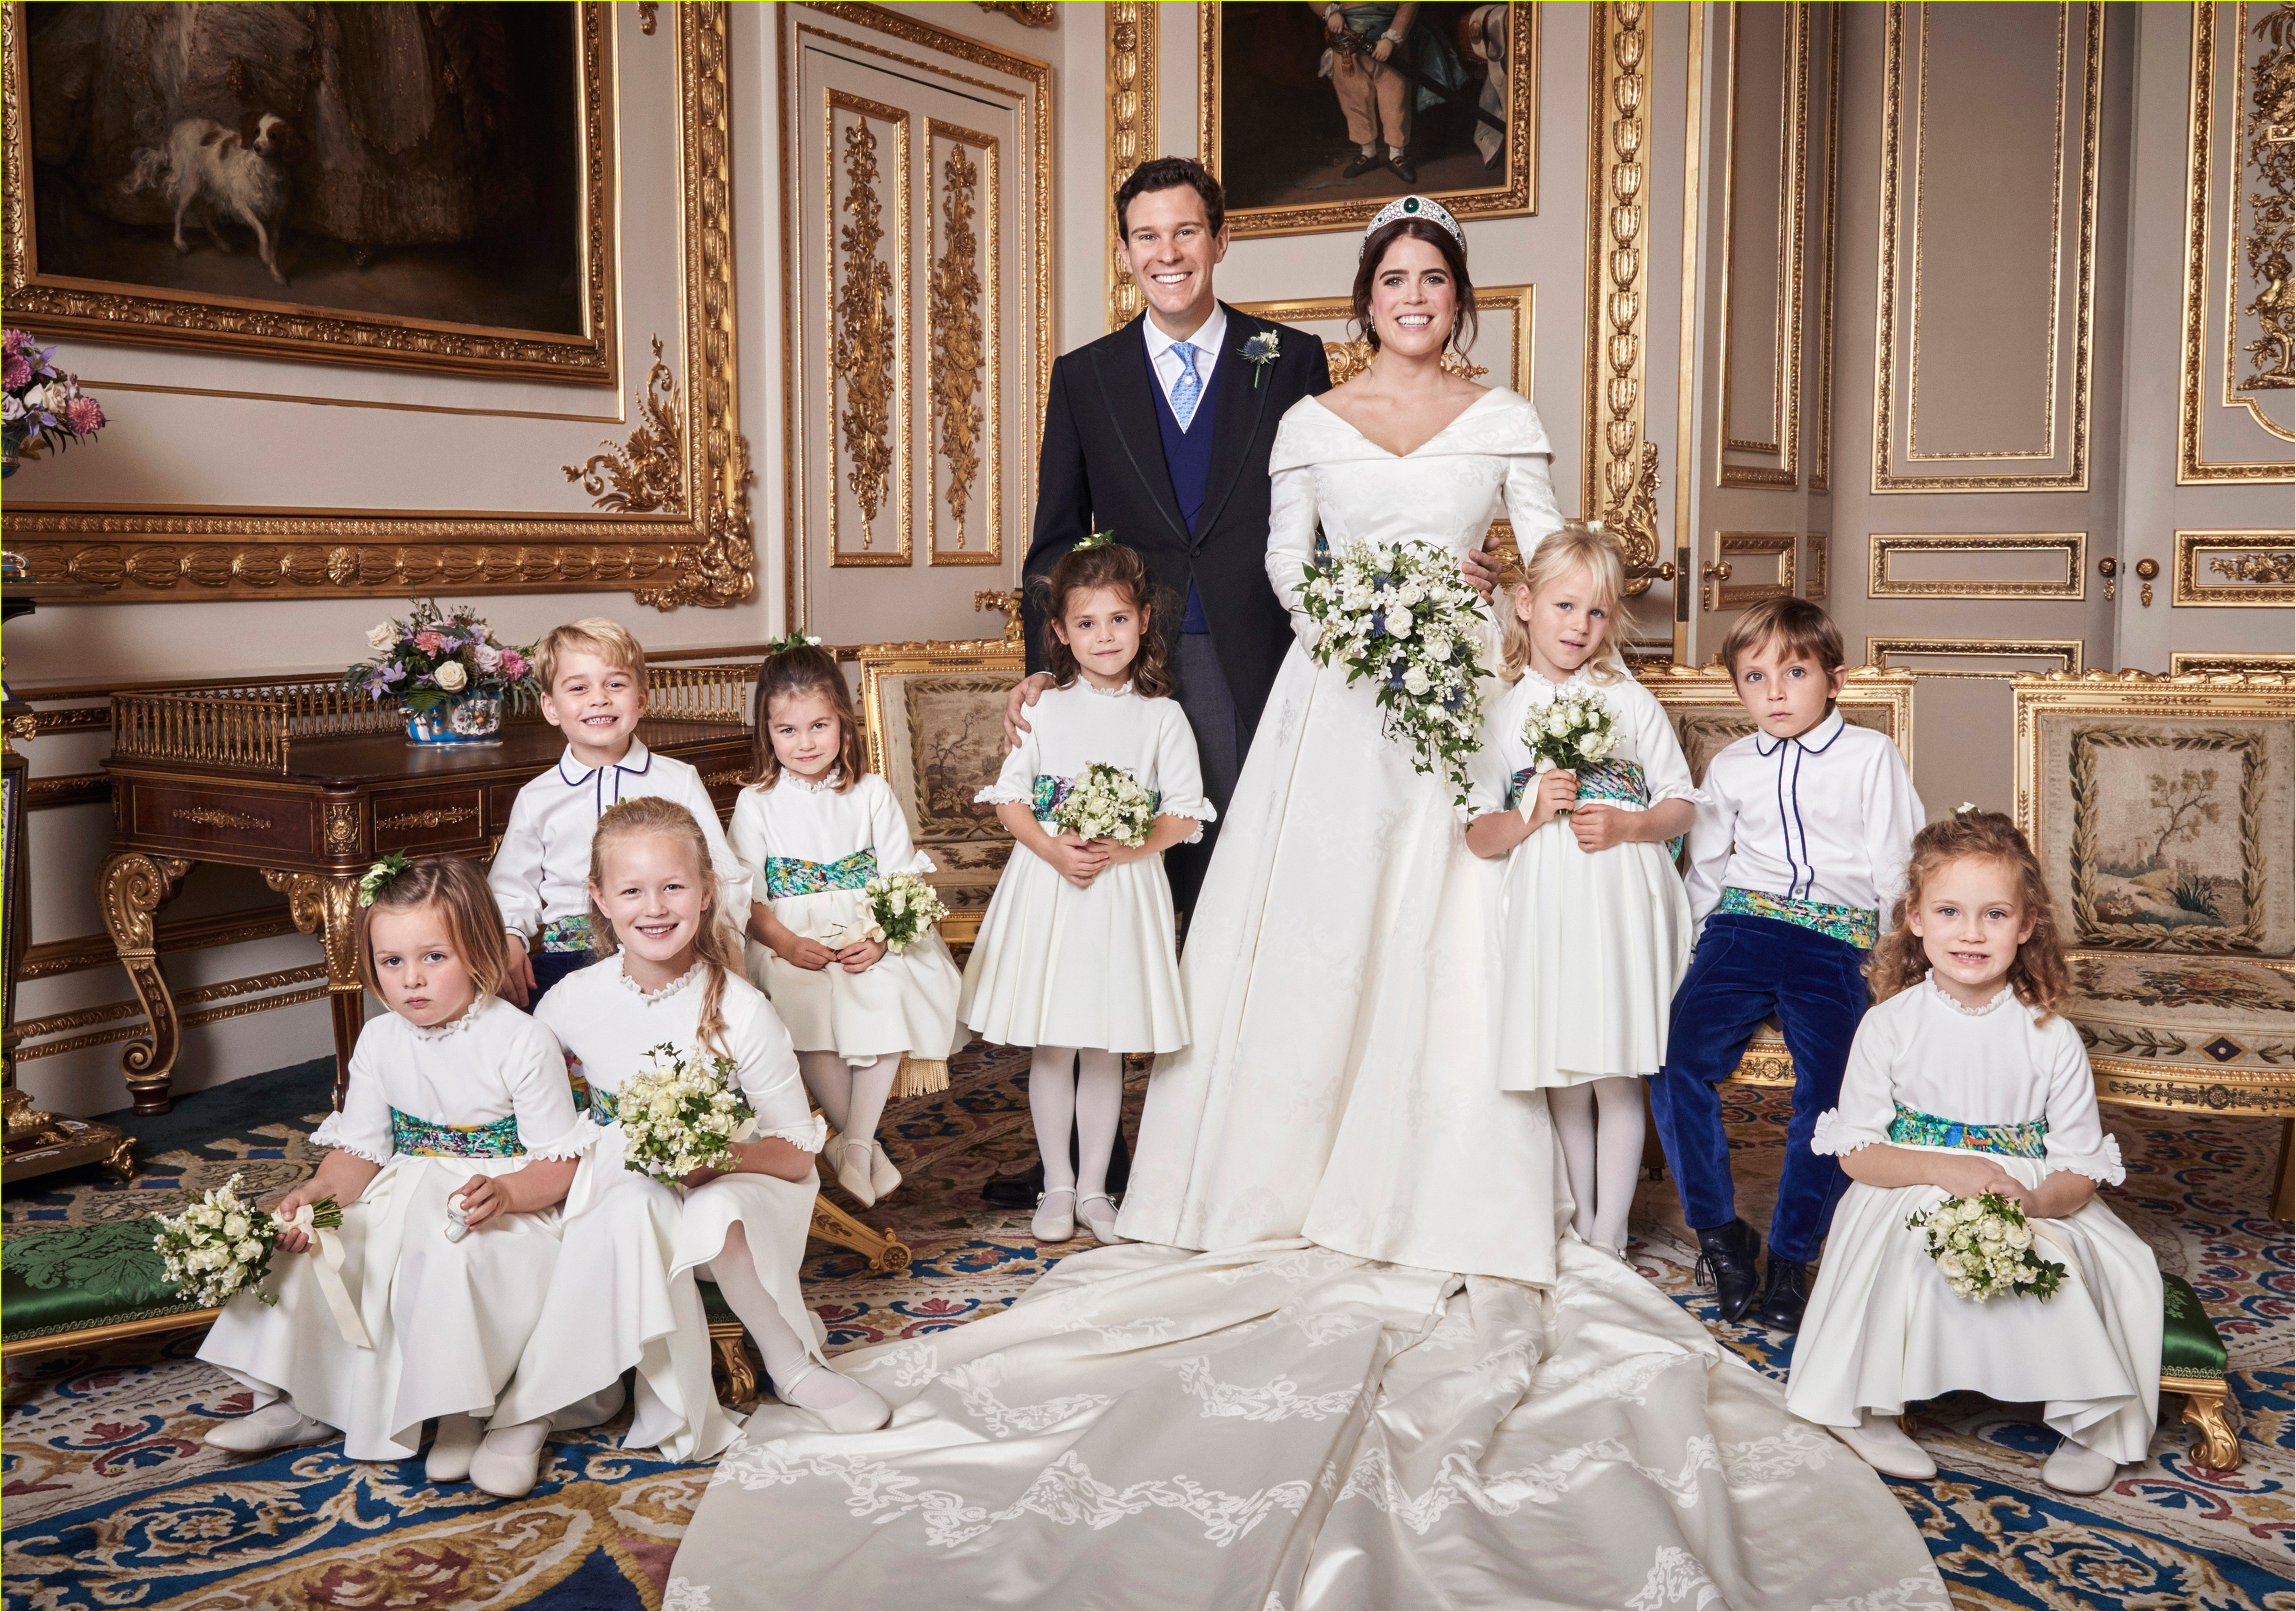 princess eugenie jack brooksbank official wedding portraits revealed 014164375